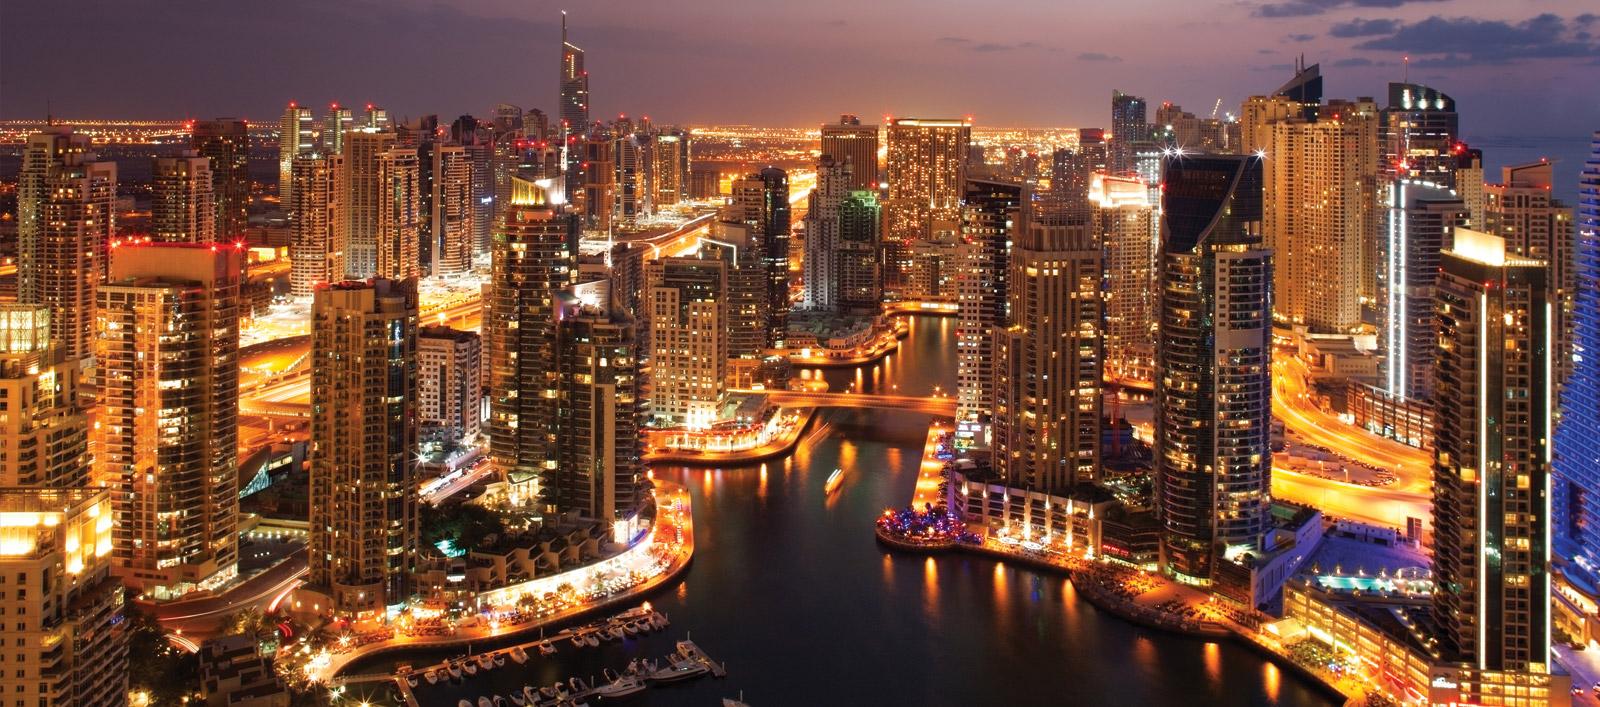 Photo of السياحة في دبي مفتوحة بدءًا من اليوم.. هذه الإرشادات